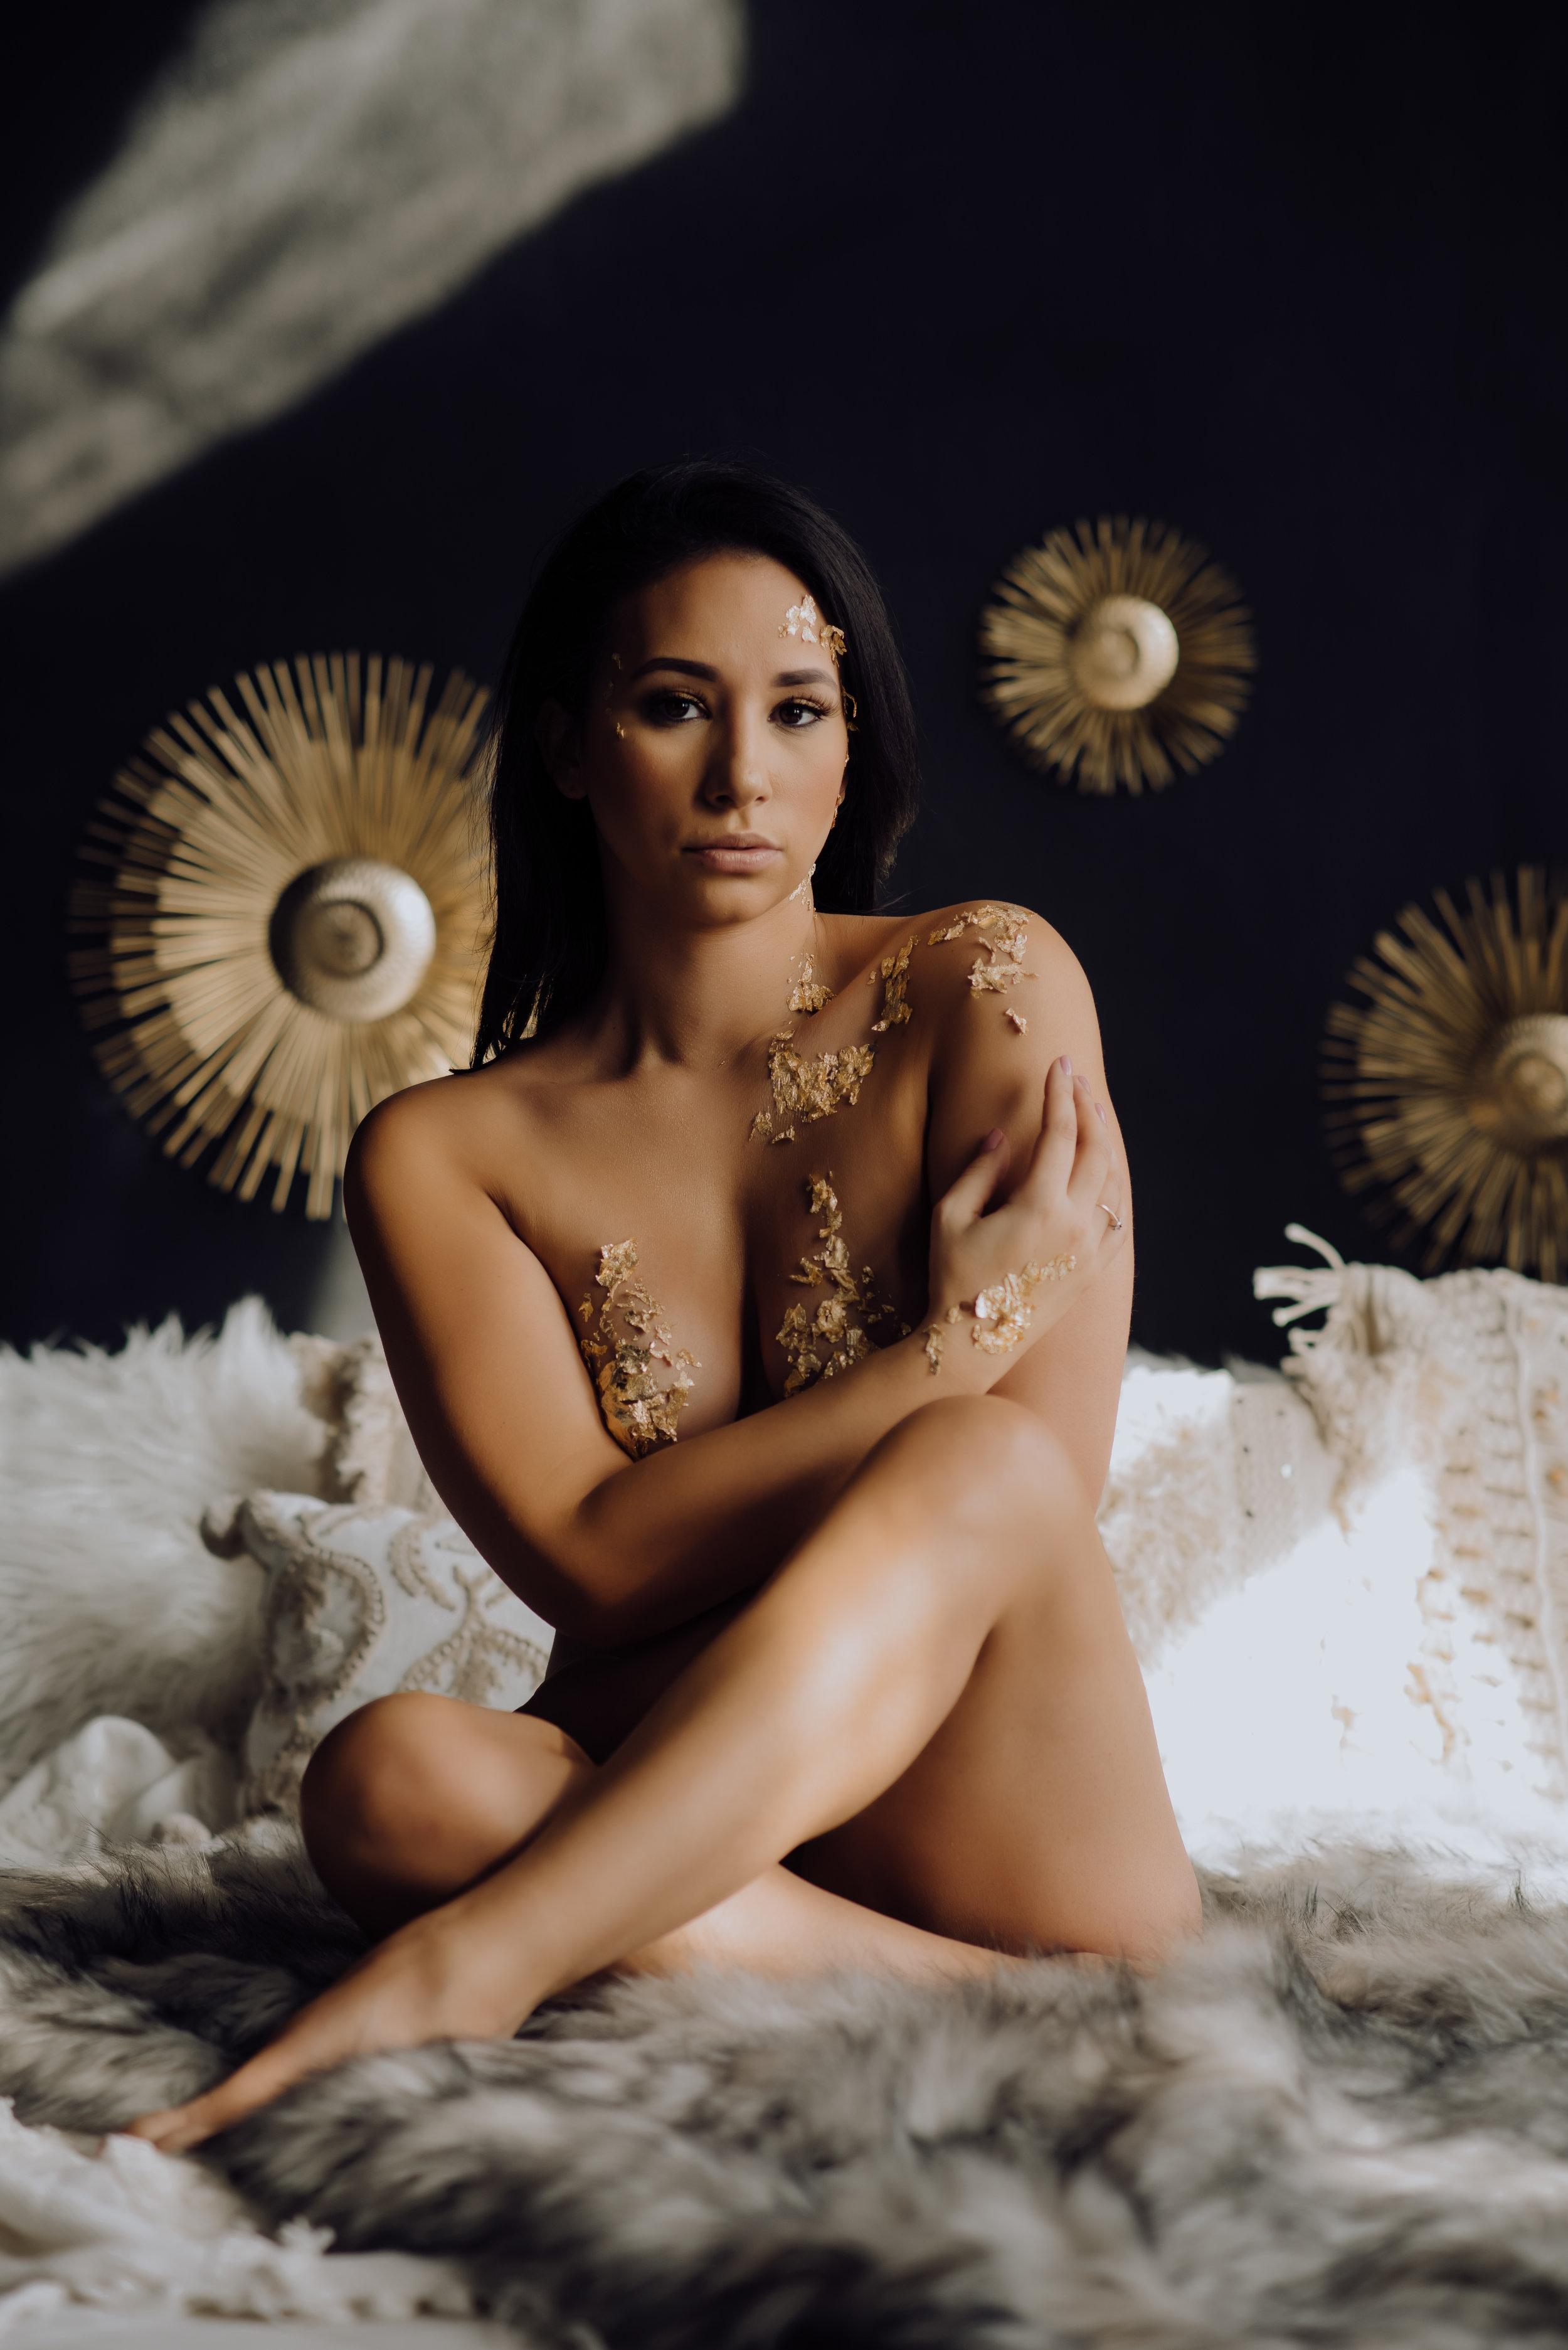 boudoir-photographer-gold-foil-85.jpg